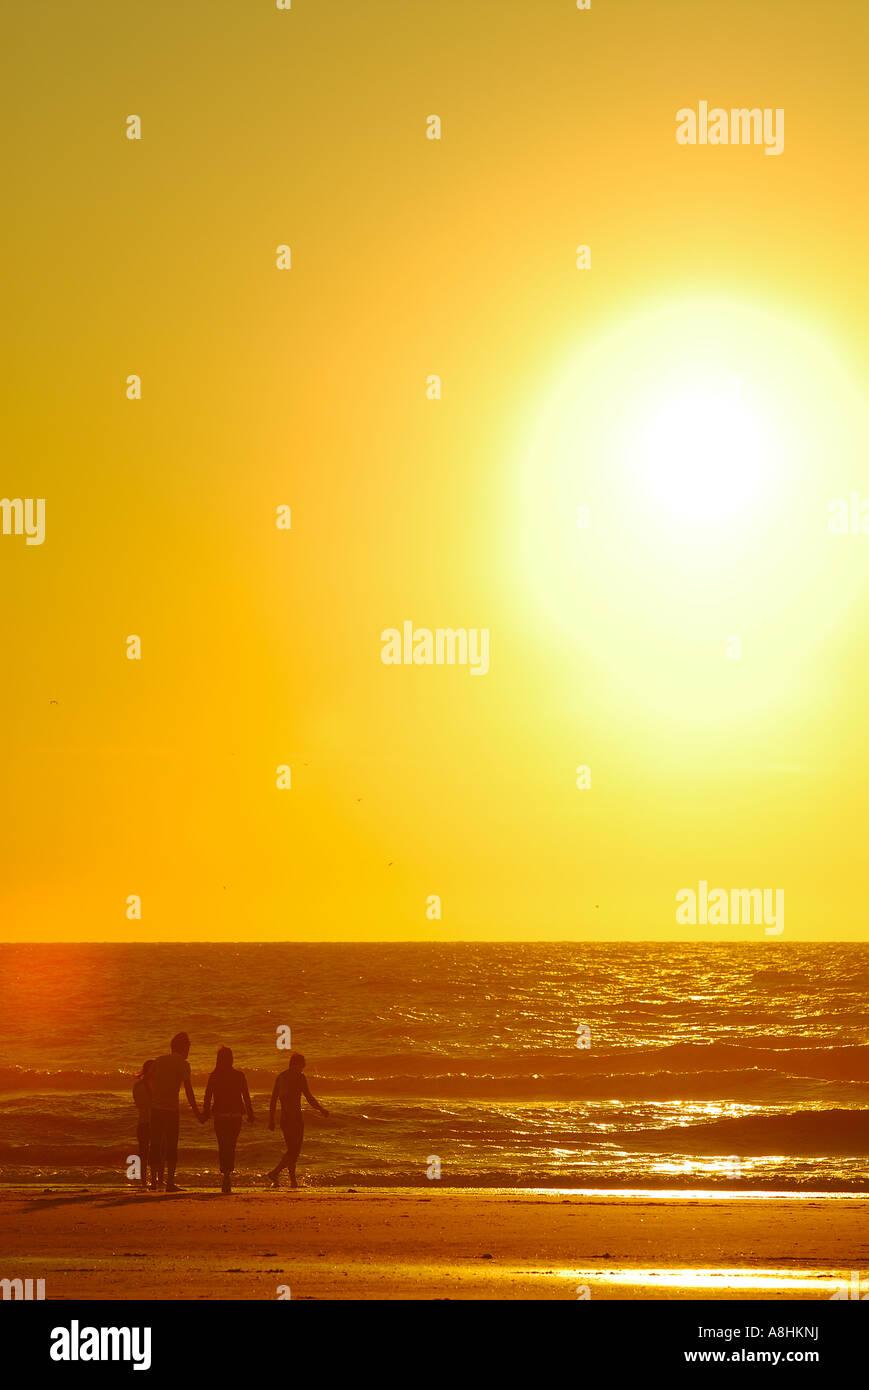 Beachlive at Hoek van Holland Holland group with joy Stock Photo